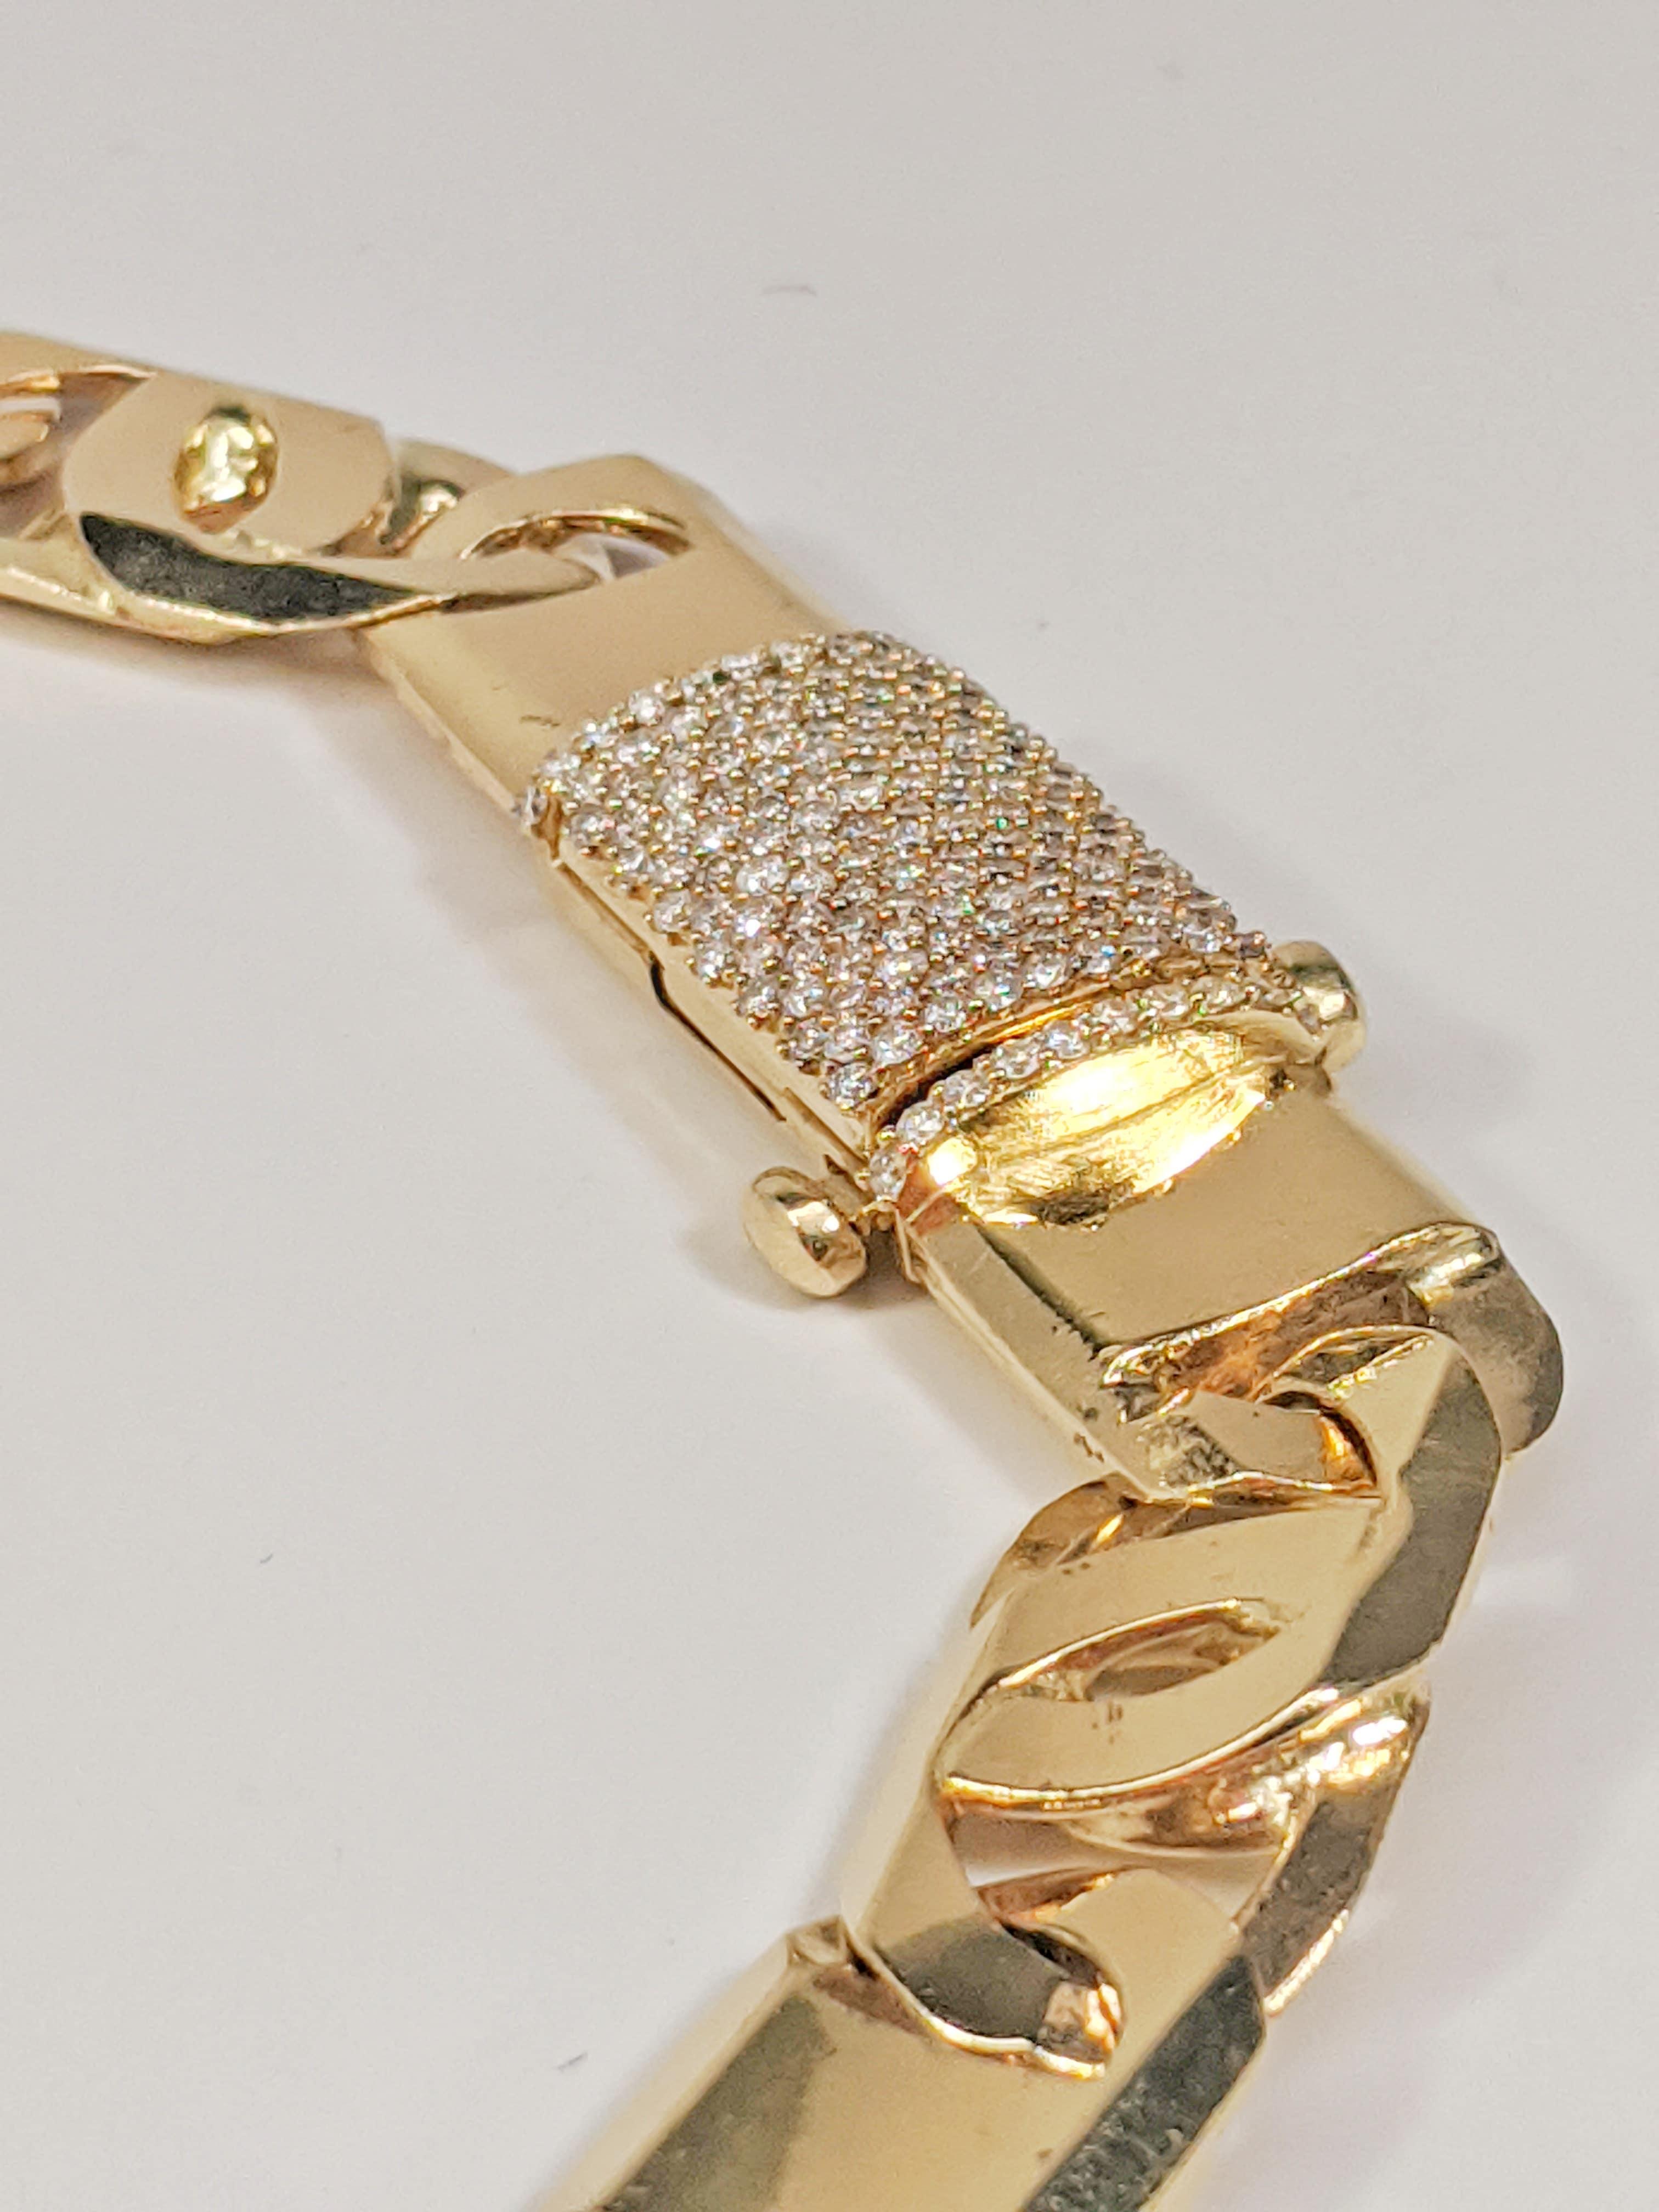 14KT Yellow Gold Solid Heavy Fancy Tiger Eye Link Chain, Hand Made Italian Chain 12MM wide, VVS Pave Diamond Lock, Cuban Box Lock, Lock Side View